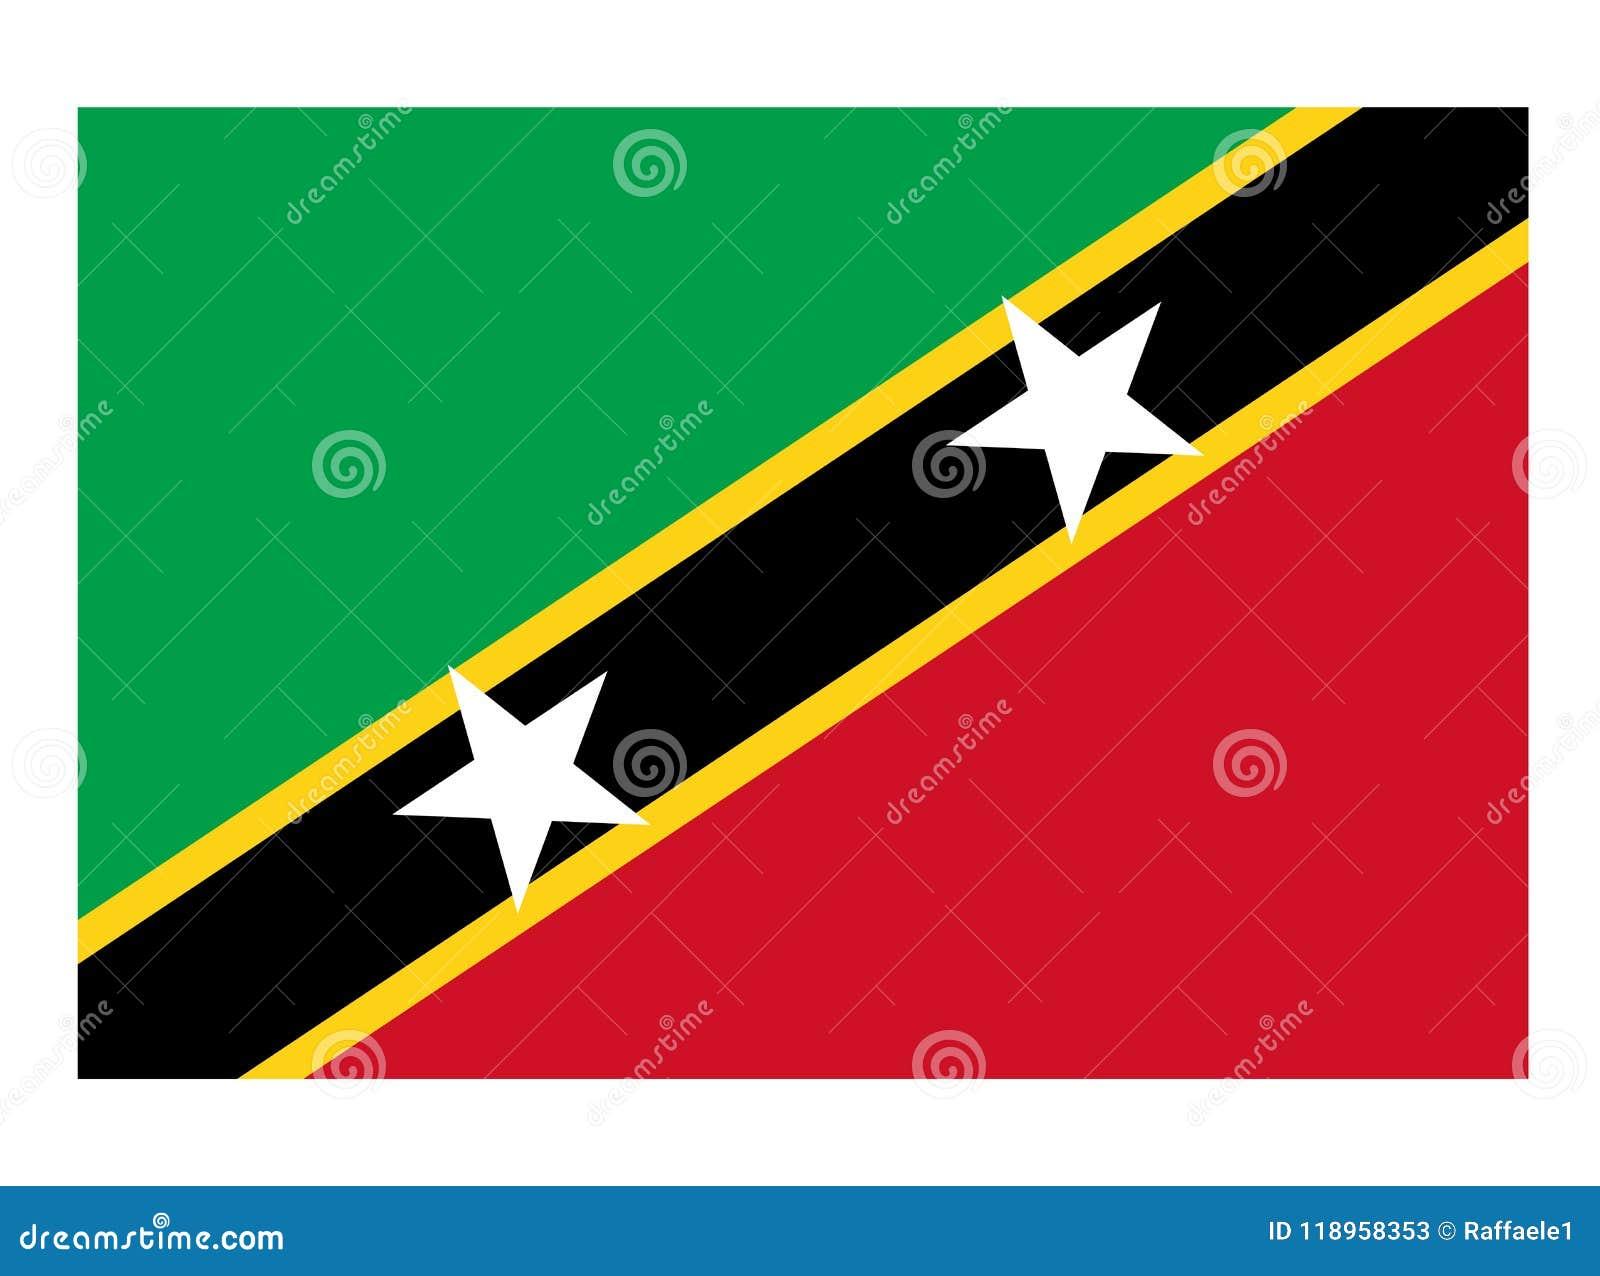 flag of saint kitts and nevis stock vector illustration of flag